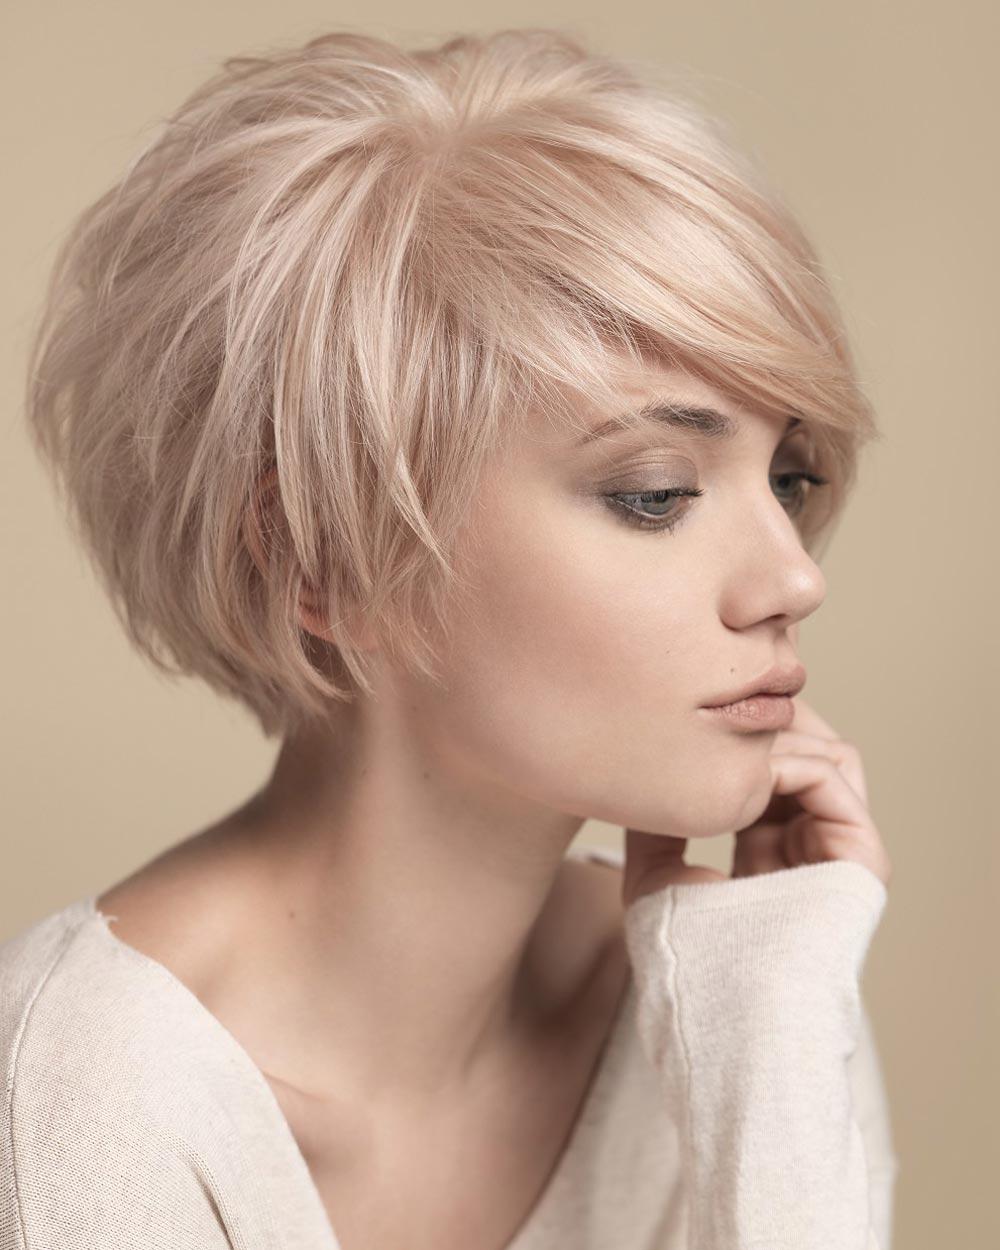 Короткая стрижка 2018 для блондинки